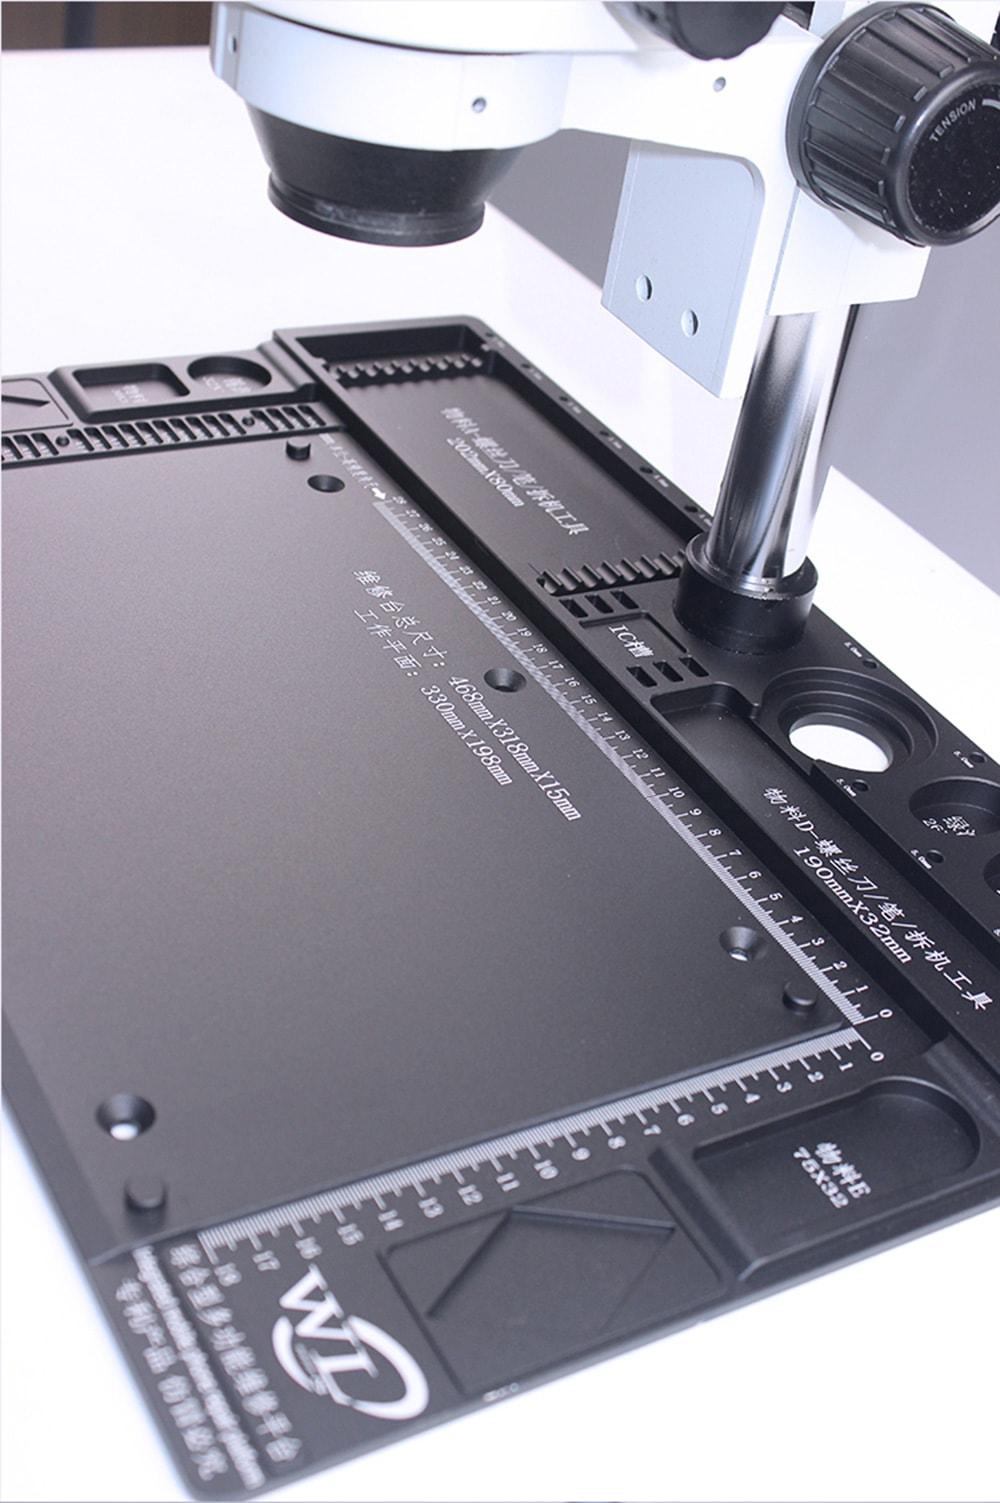 WL Aluminium Alloy Maintenance Platform Microscope Pad 468mm x 318mm